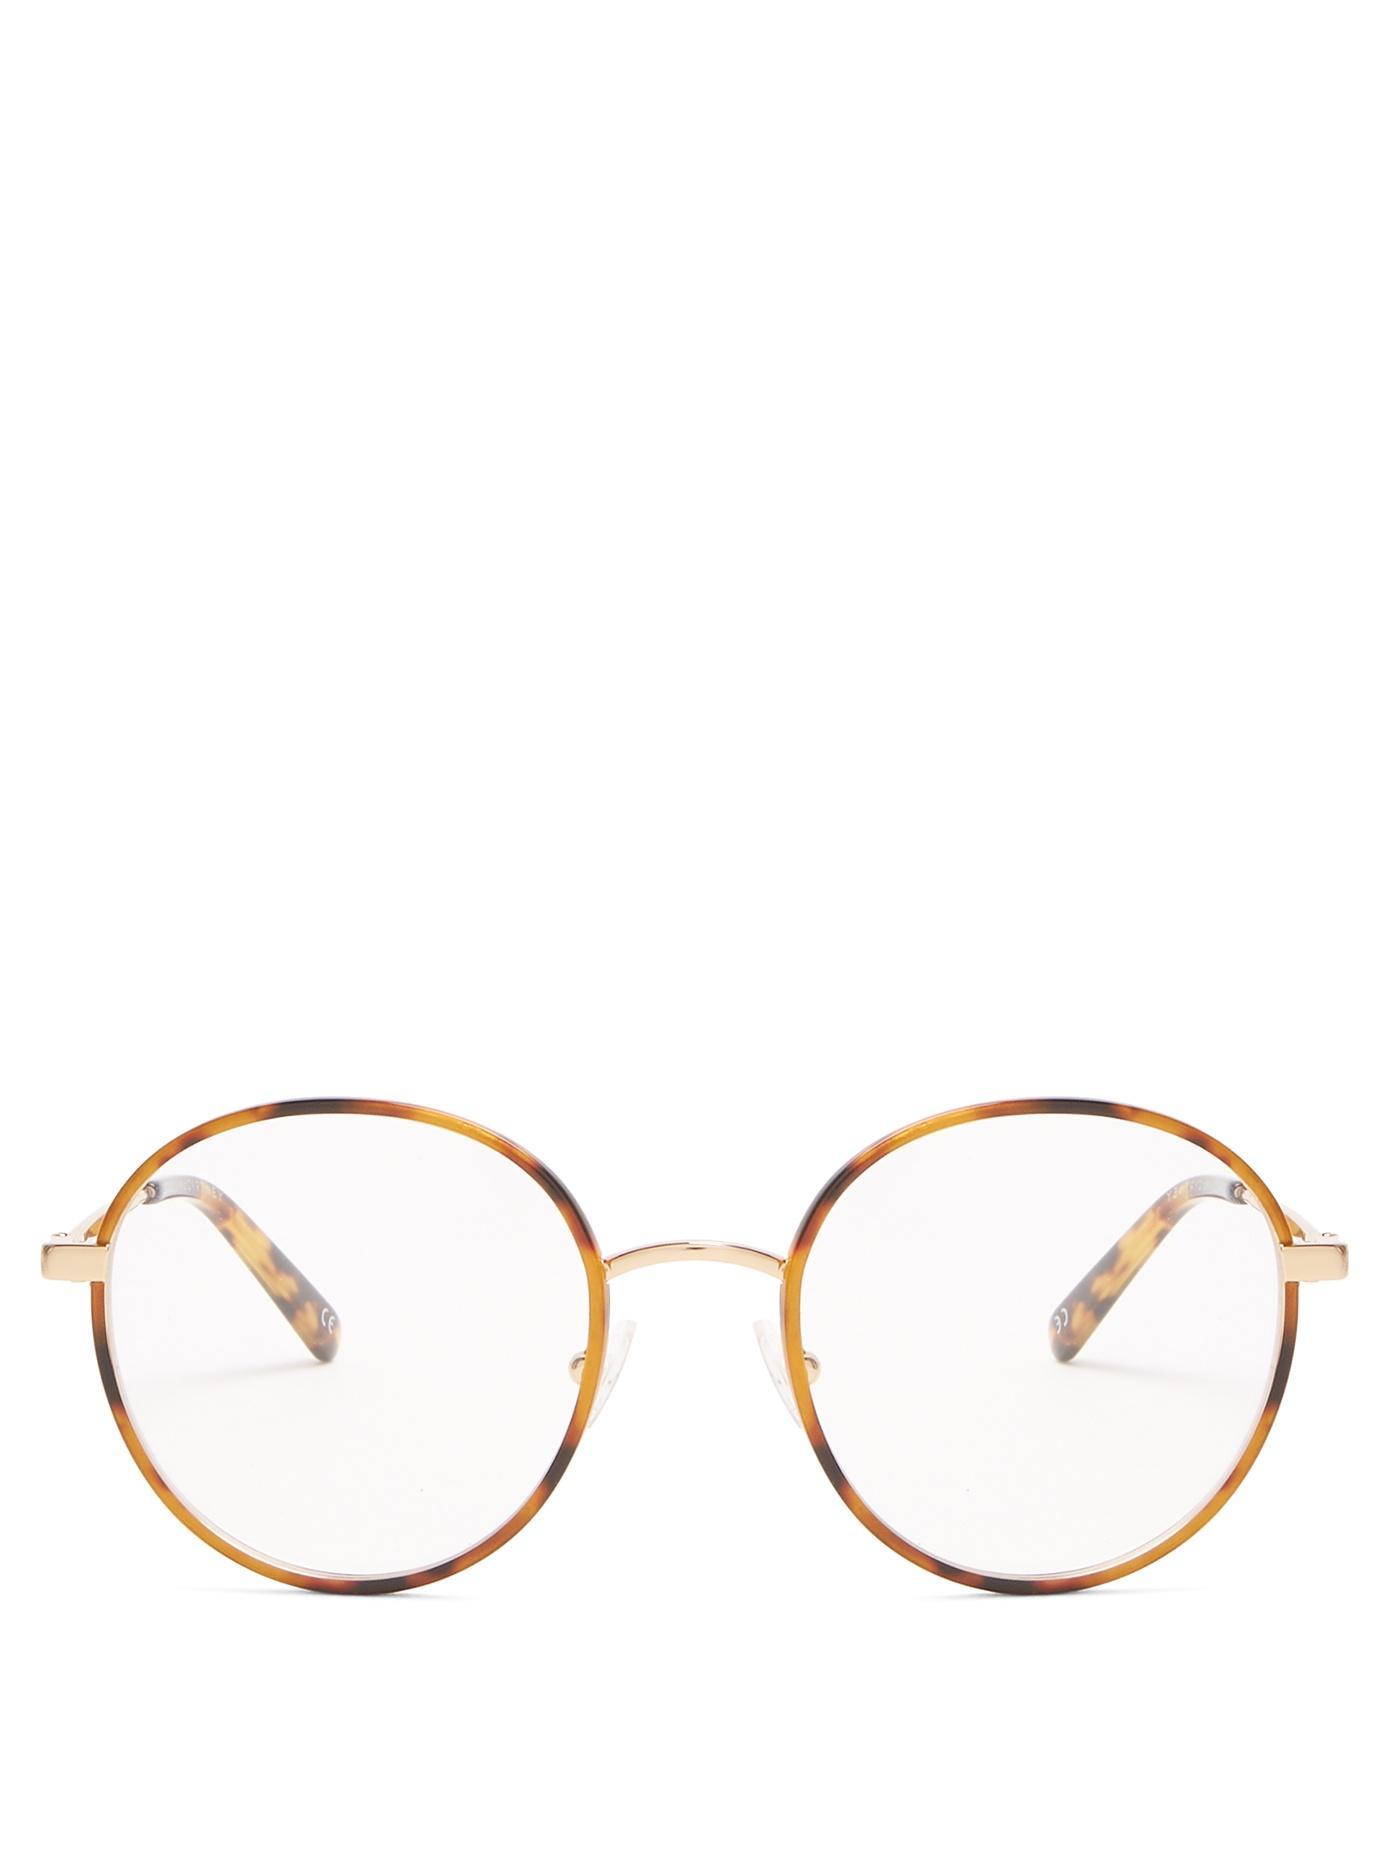 Stella Mccartney Round-Frame Metal Glasses In Tortoiseshell